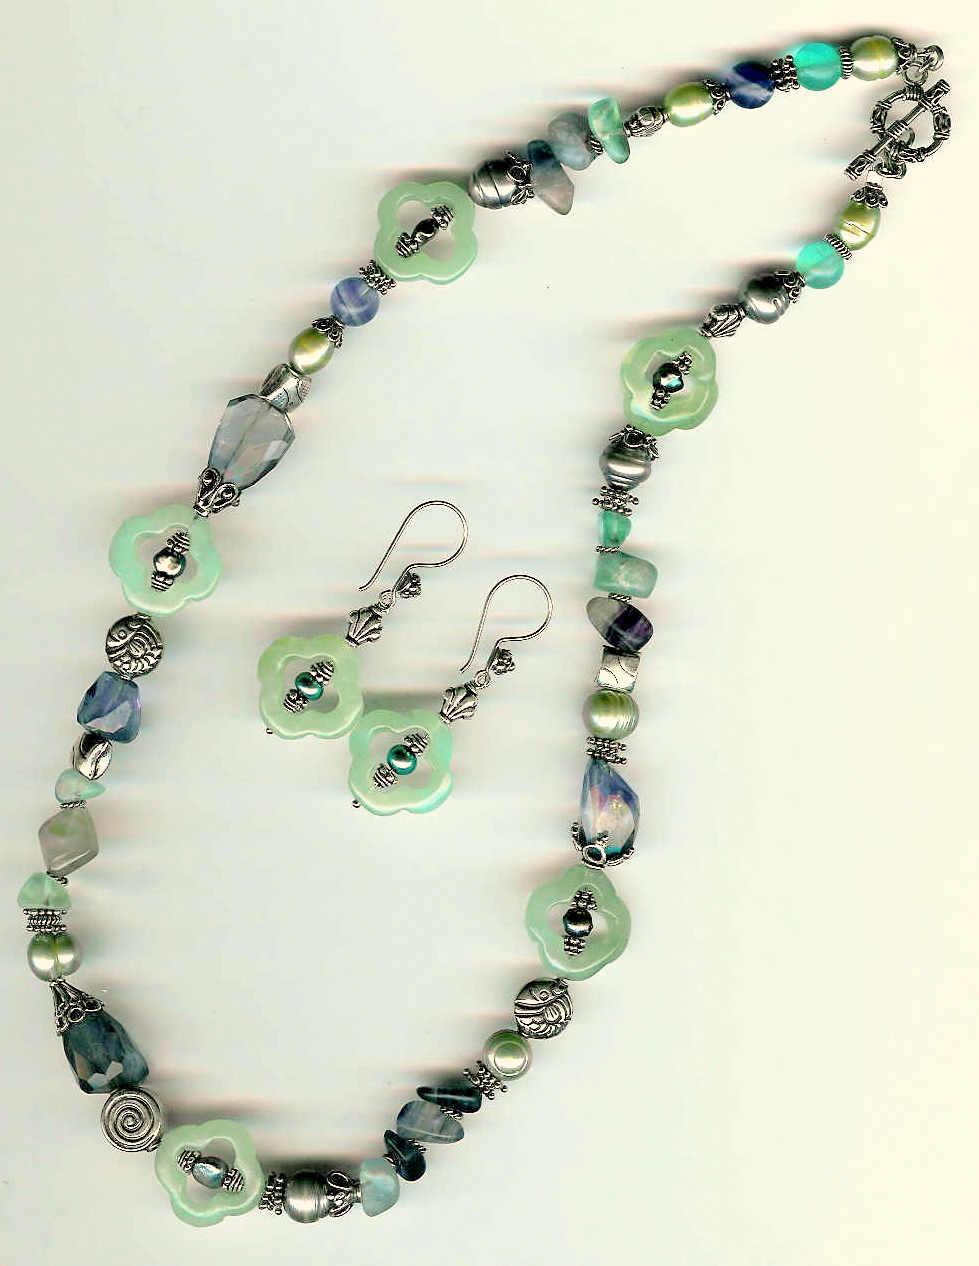 66. Carved Jade, Amethyst Freshwater Pearls, Aventurine, Fluorite with Bali Sterling Silver+Earring